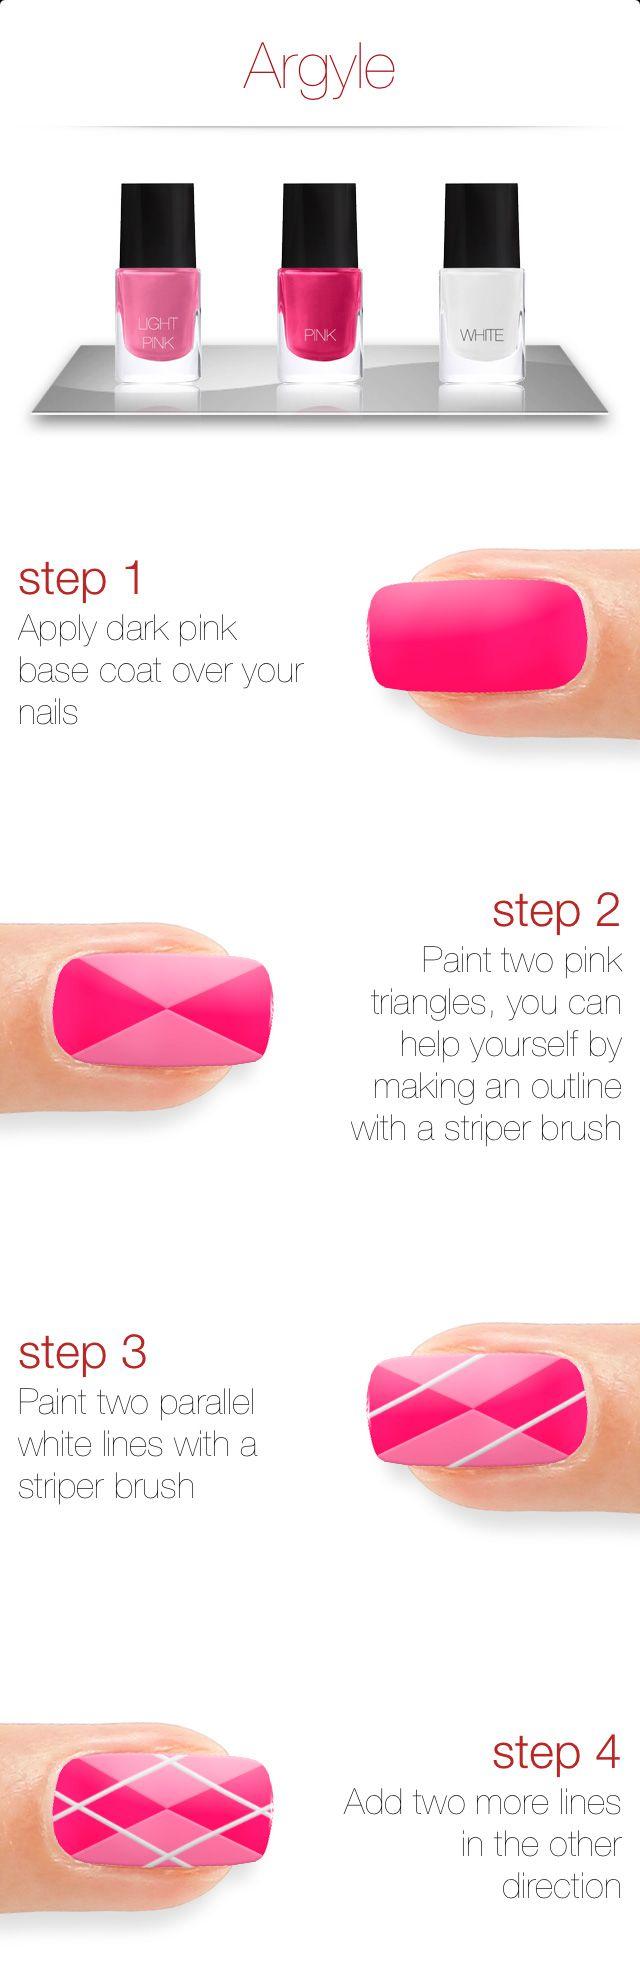 Argyle nail art nail art design options pinterest argyle nails